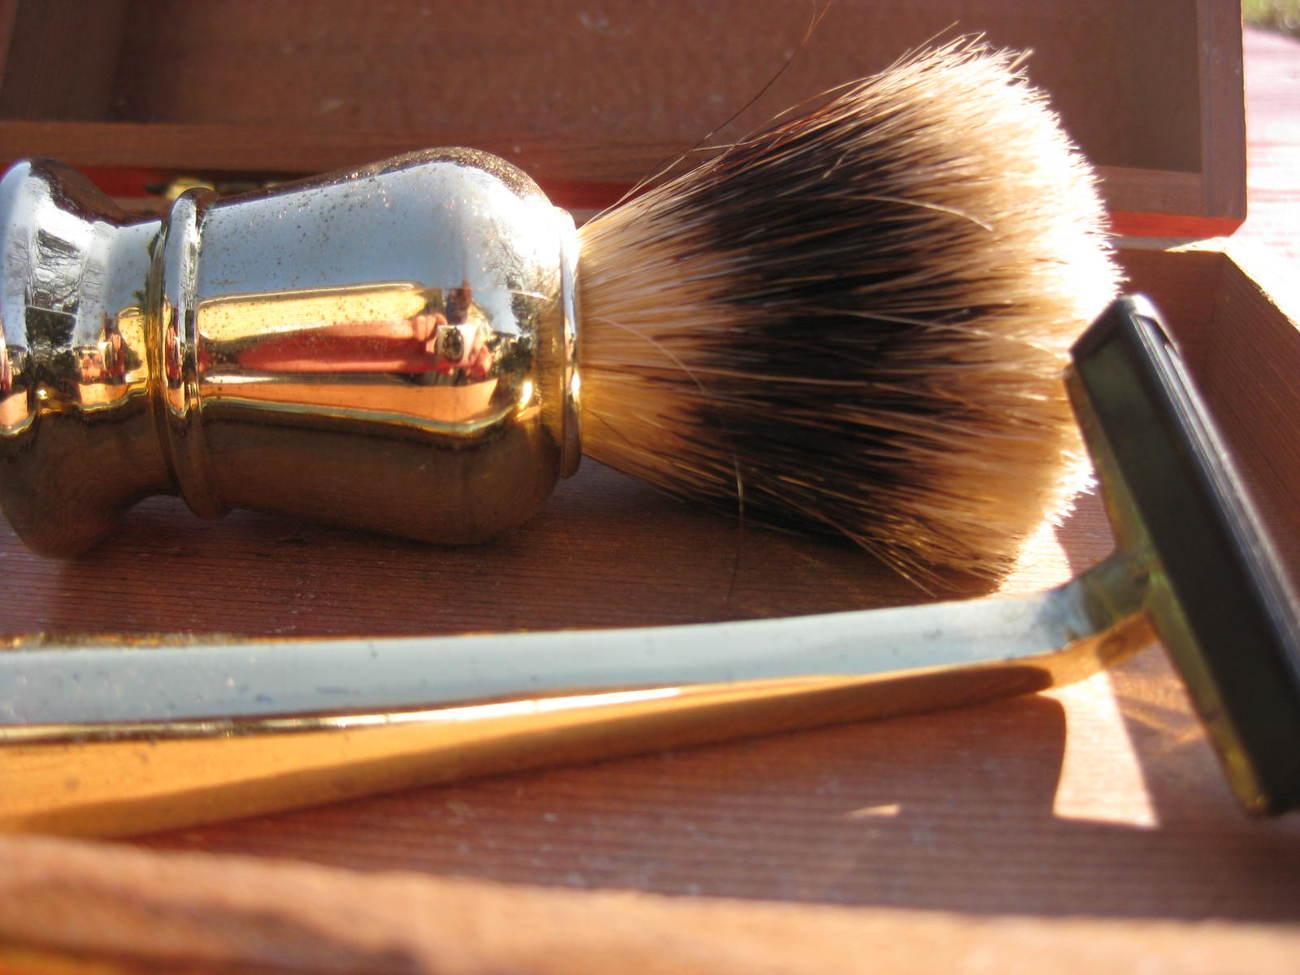 Old Fashioned Shaving Kit Nz